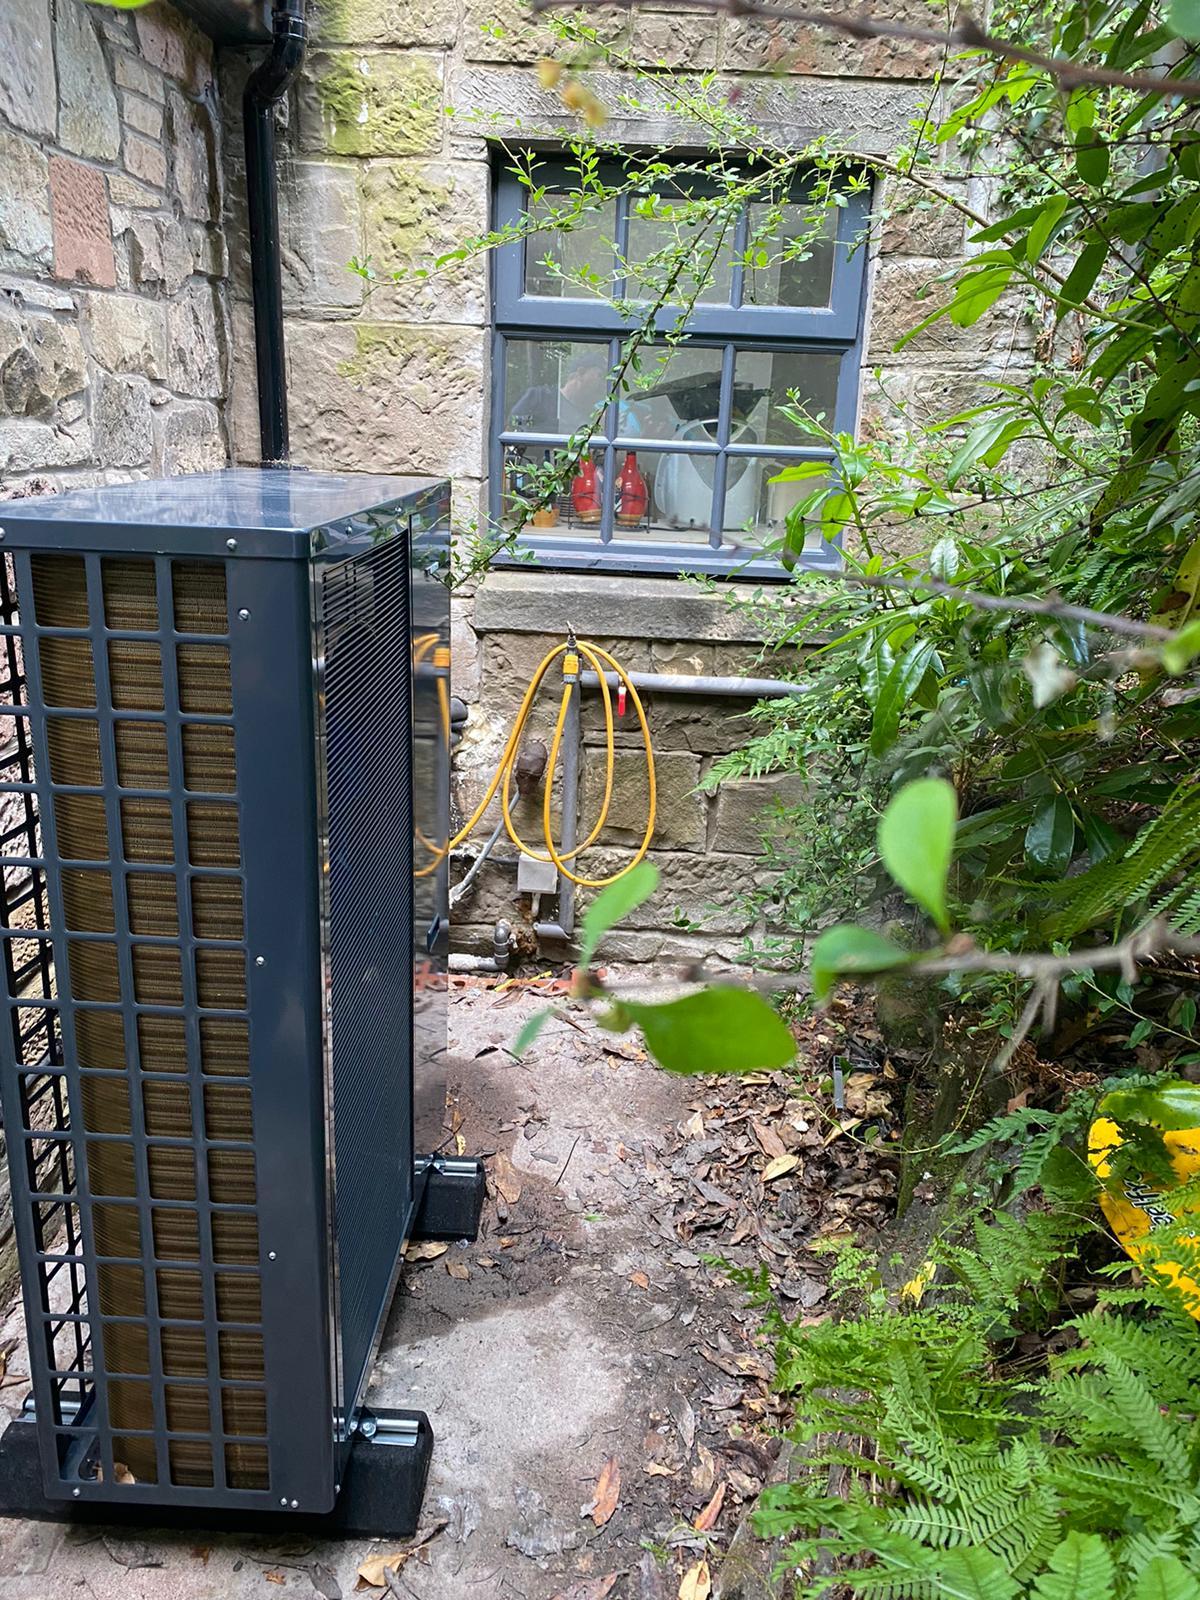 Warmflow AS03 Air Source Heat Pump 17kW